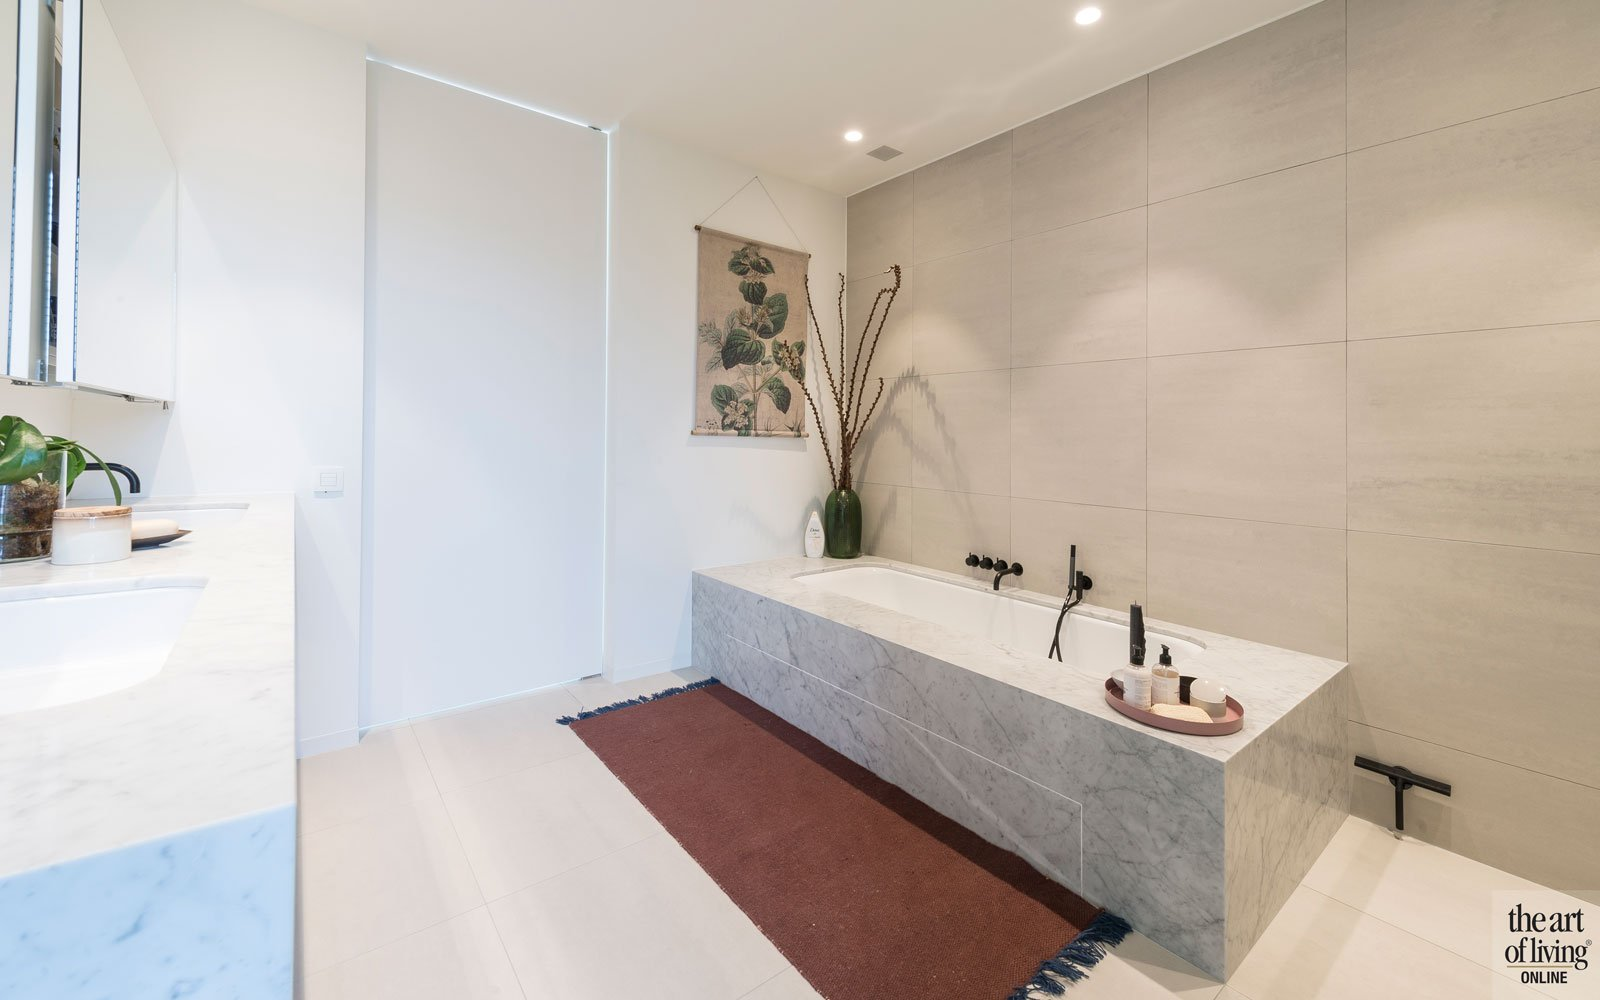 Badkamer, sanitair, natuursteen, tegels, Mosa, Aqualex, kraan, groepspraktijk, Jelle Vandecasteele